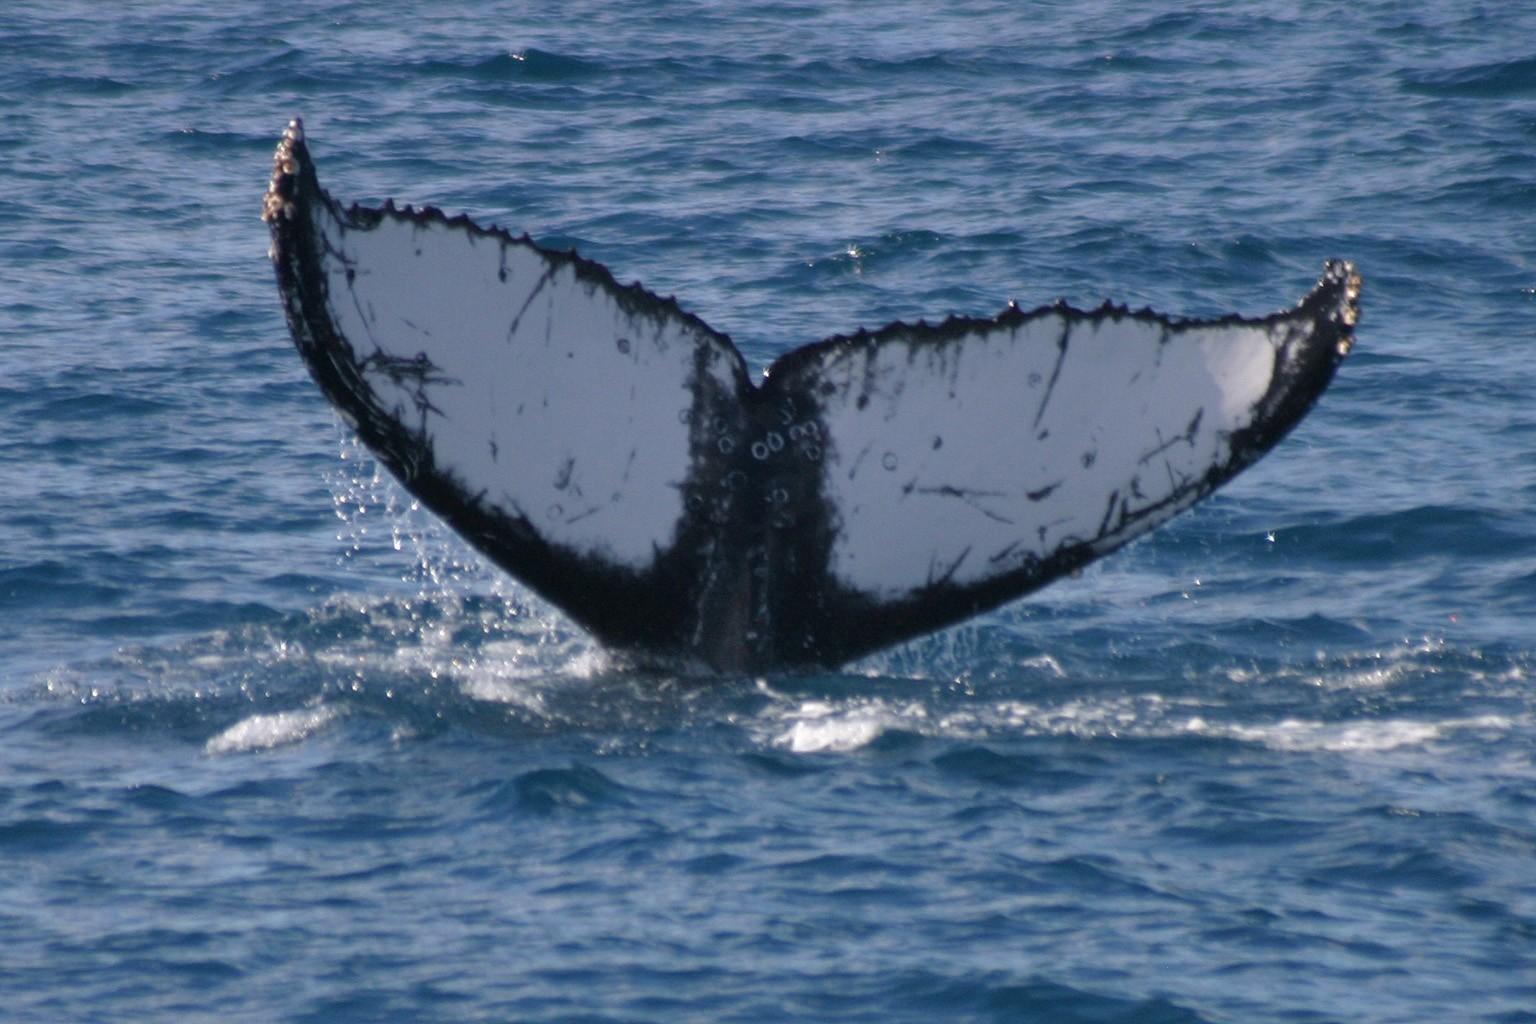 Humphrey the Humpback Whale